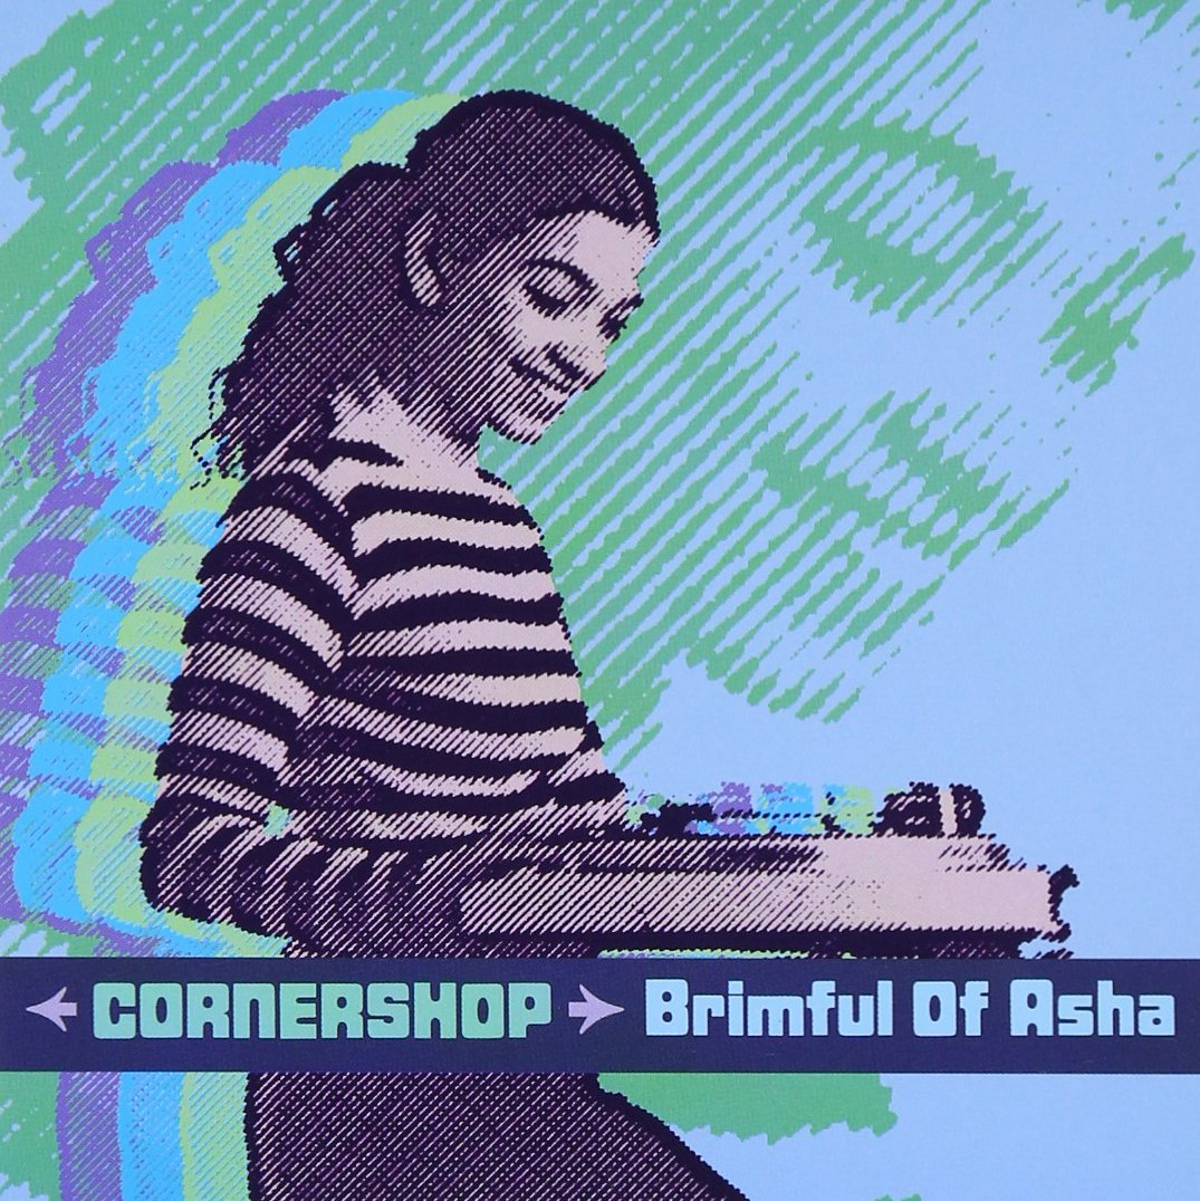 Brimful Of Asha - Cornershop testo e traduzione